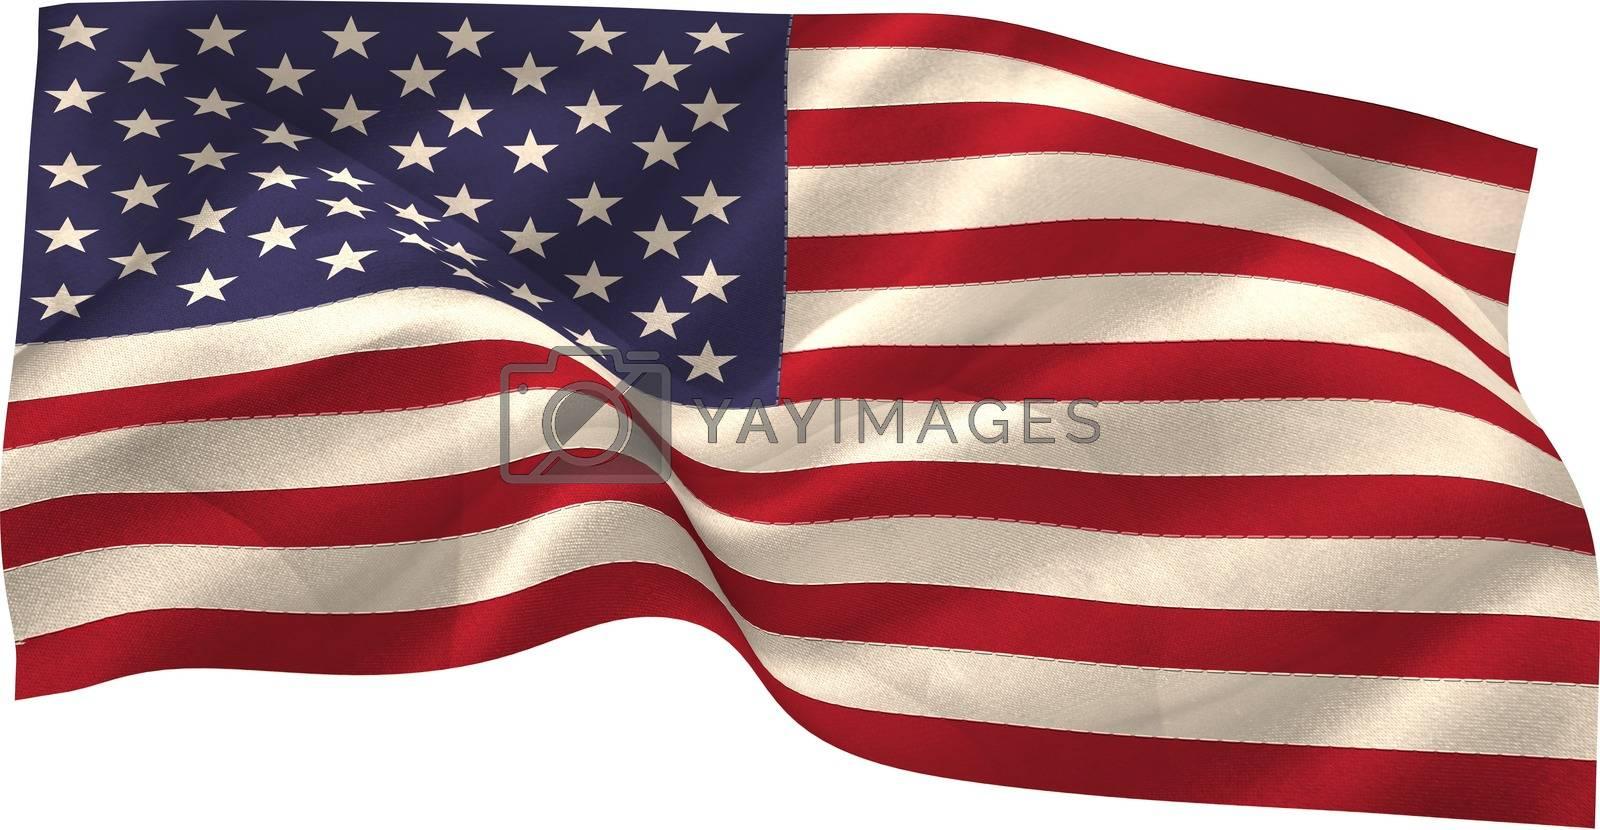 Royalty free image of Digitally generated united states national flag by Wavebreakmedia